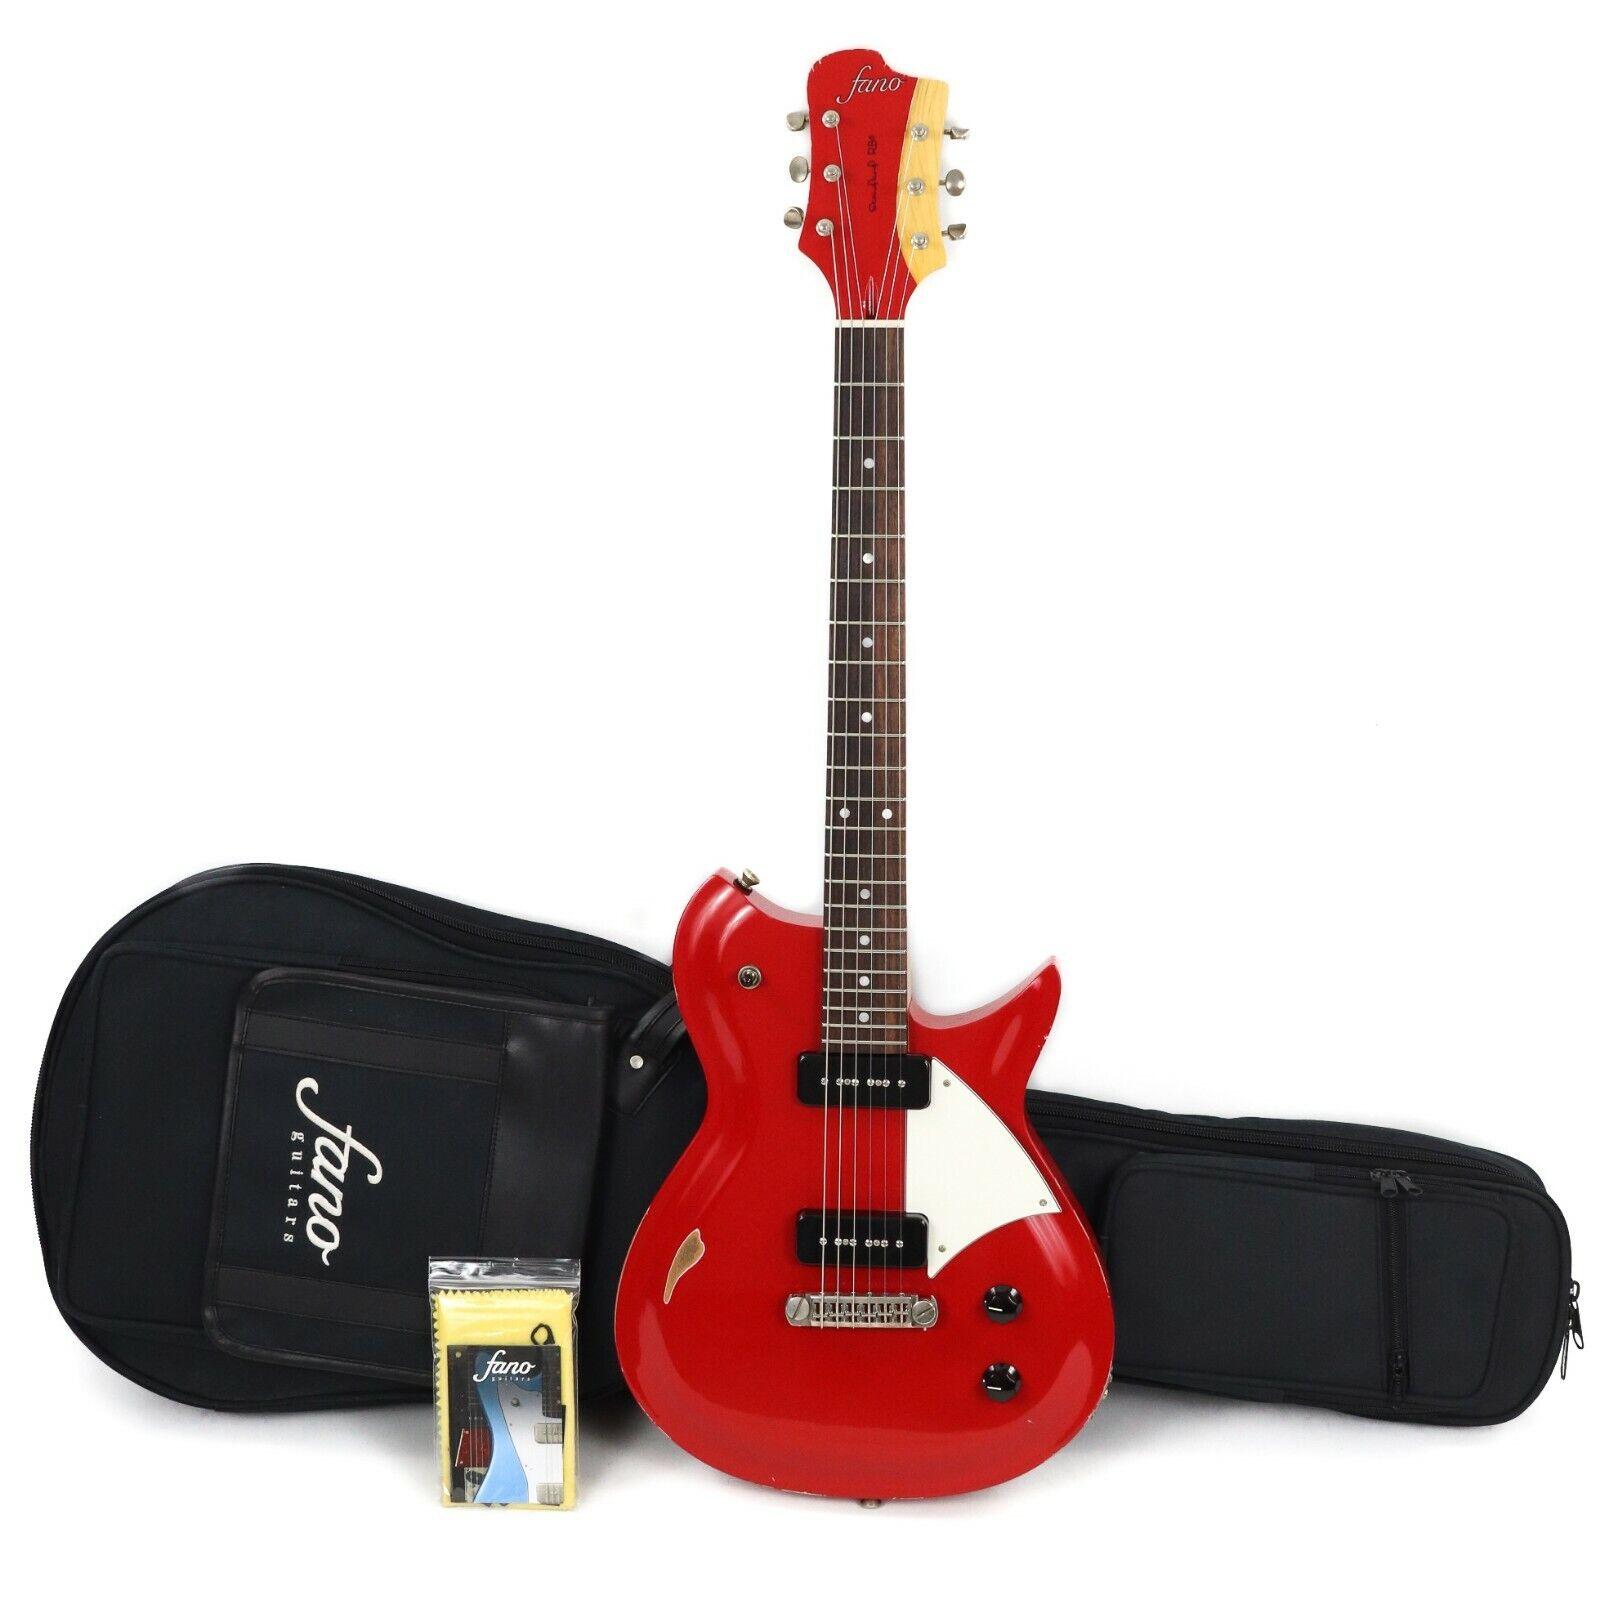 Fano RB6 Standard P90 Electric Guitar w  Gigbag - Dakota rot (Medium Distress)